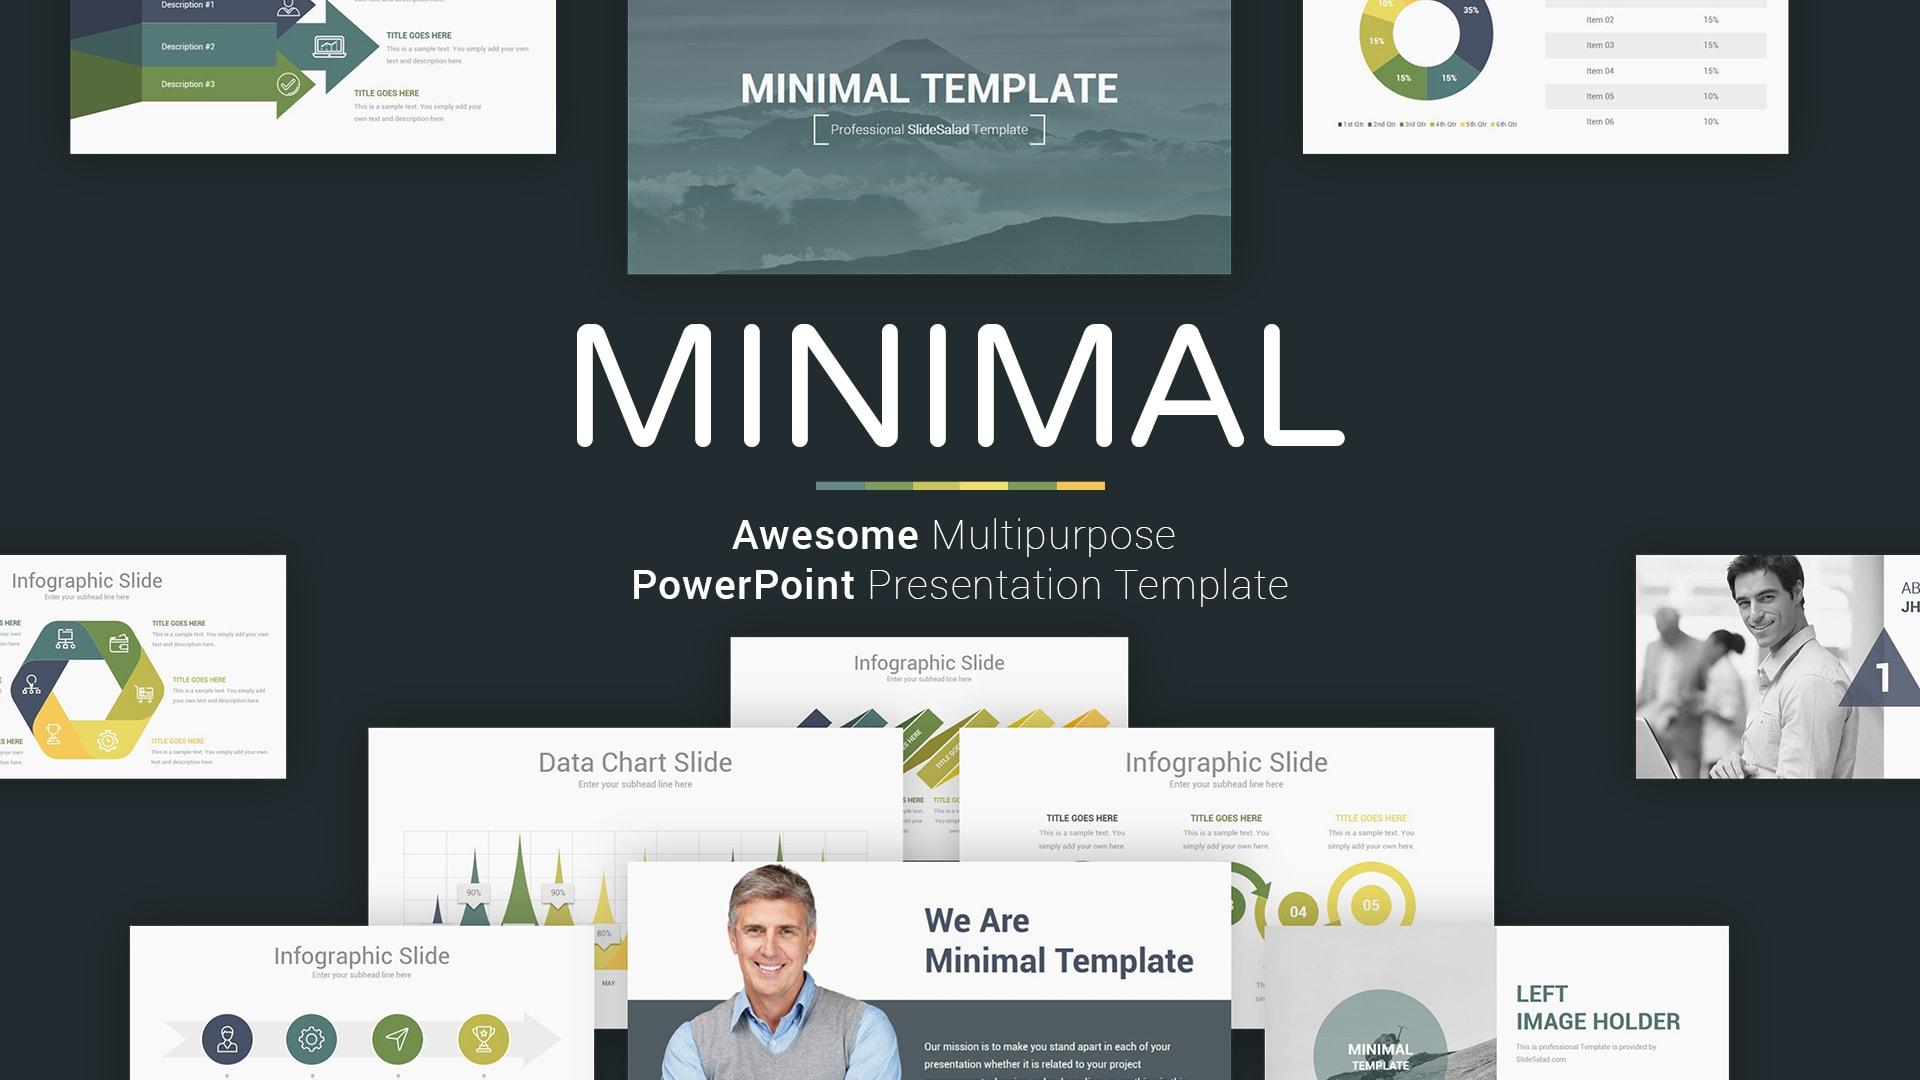 Best Minimalist PowerPoint Templates of 2019 - SlideSalad